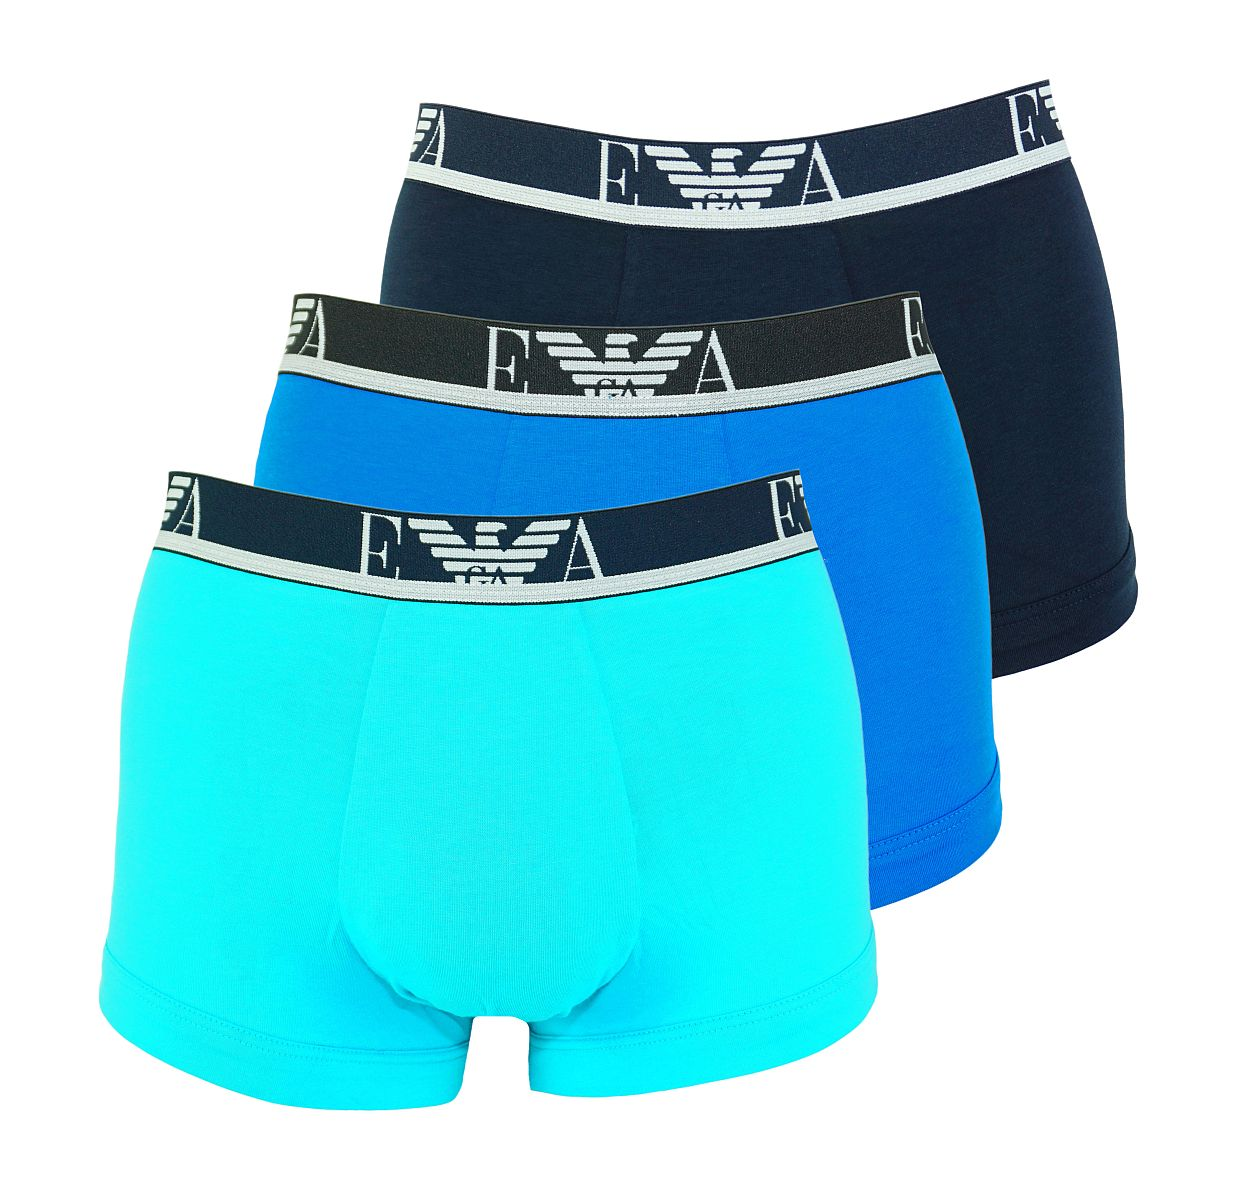 Emporio Armani 3er Pack Shorts Trunk Unterhose 111357 8P715 12583 TURCHES/MARINE/CIELO W18-EATZ1